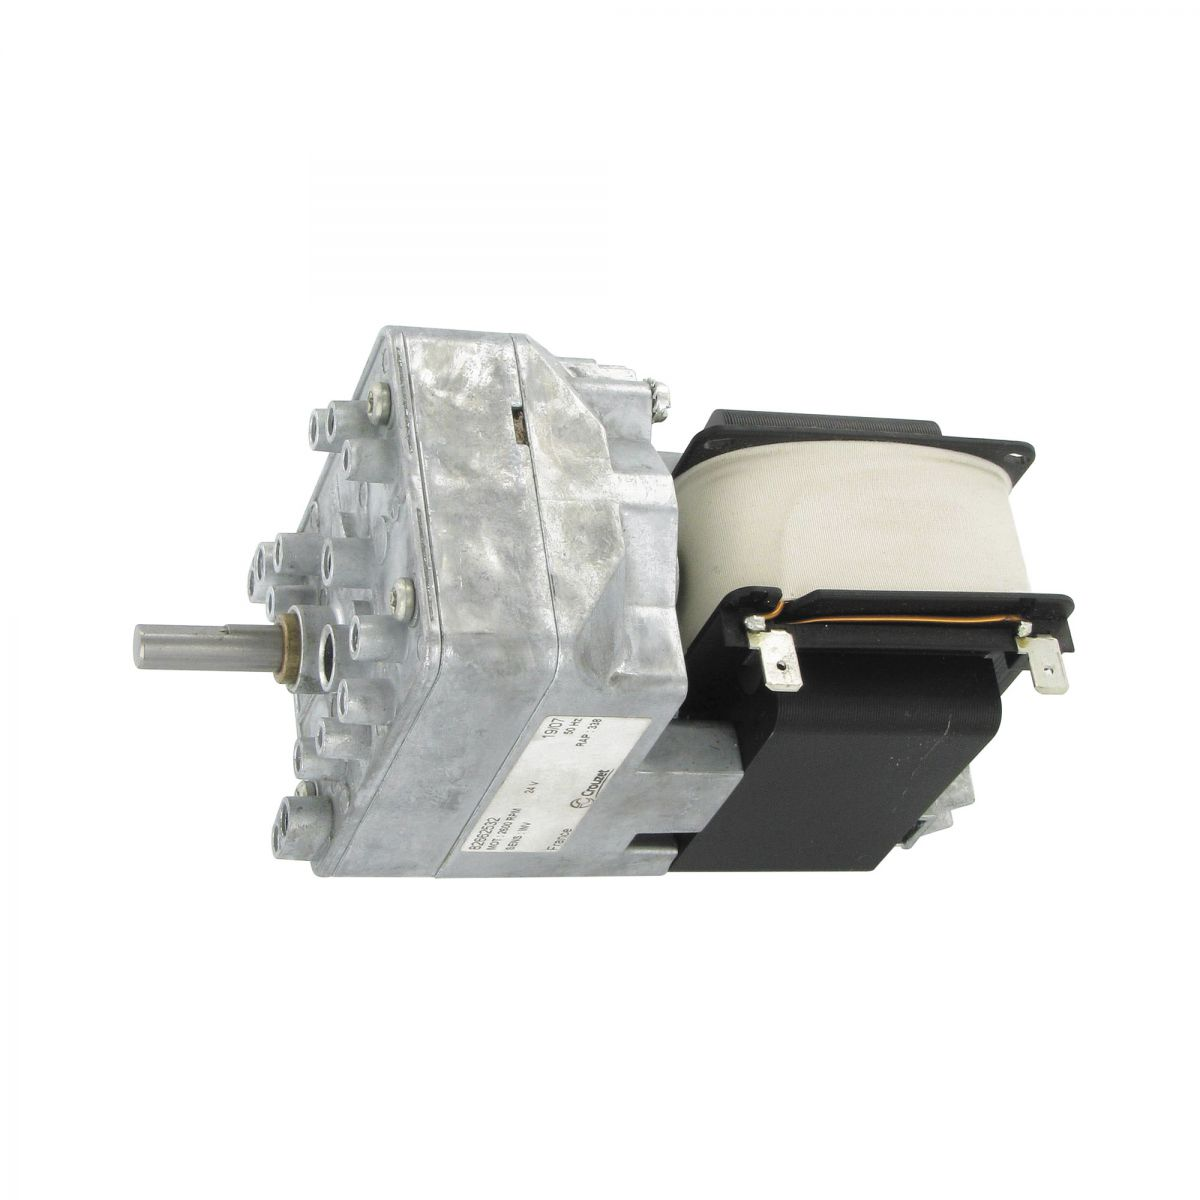 motor 24v ac50hz nom 6rpm right crouzet no 82662558